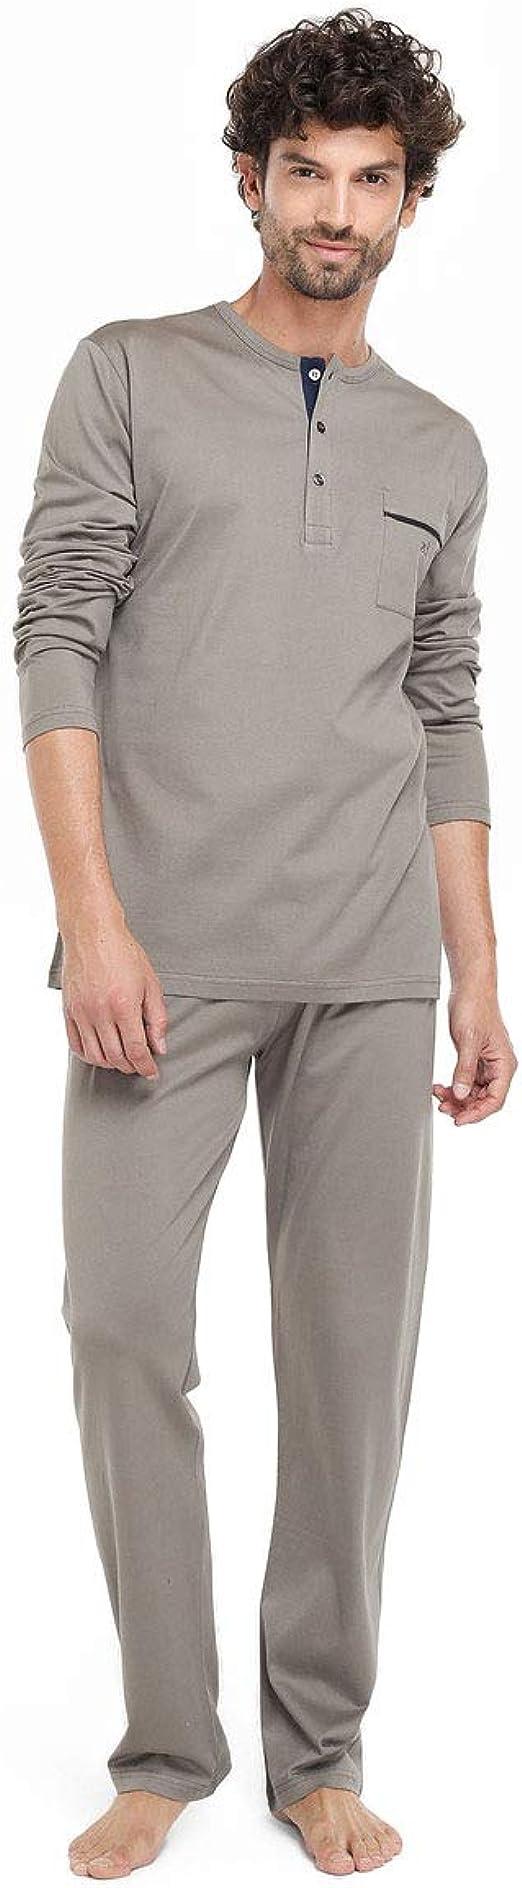 Pijama de Algodón Egipcio- Hilo de Escocia- ZD ZeroDefects ...